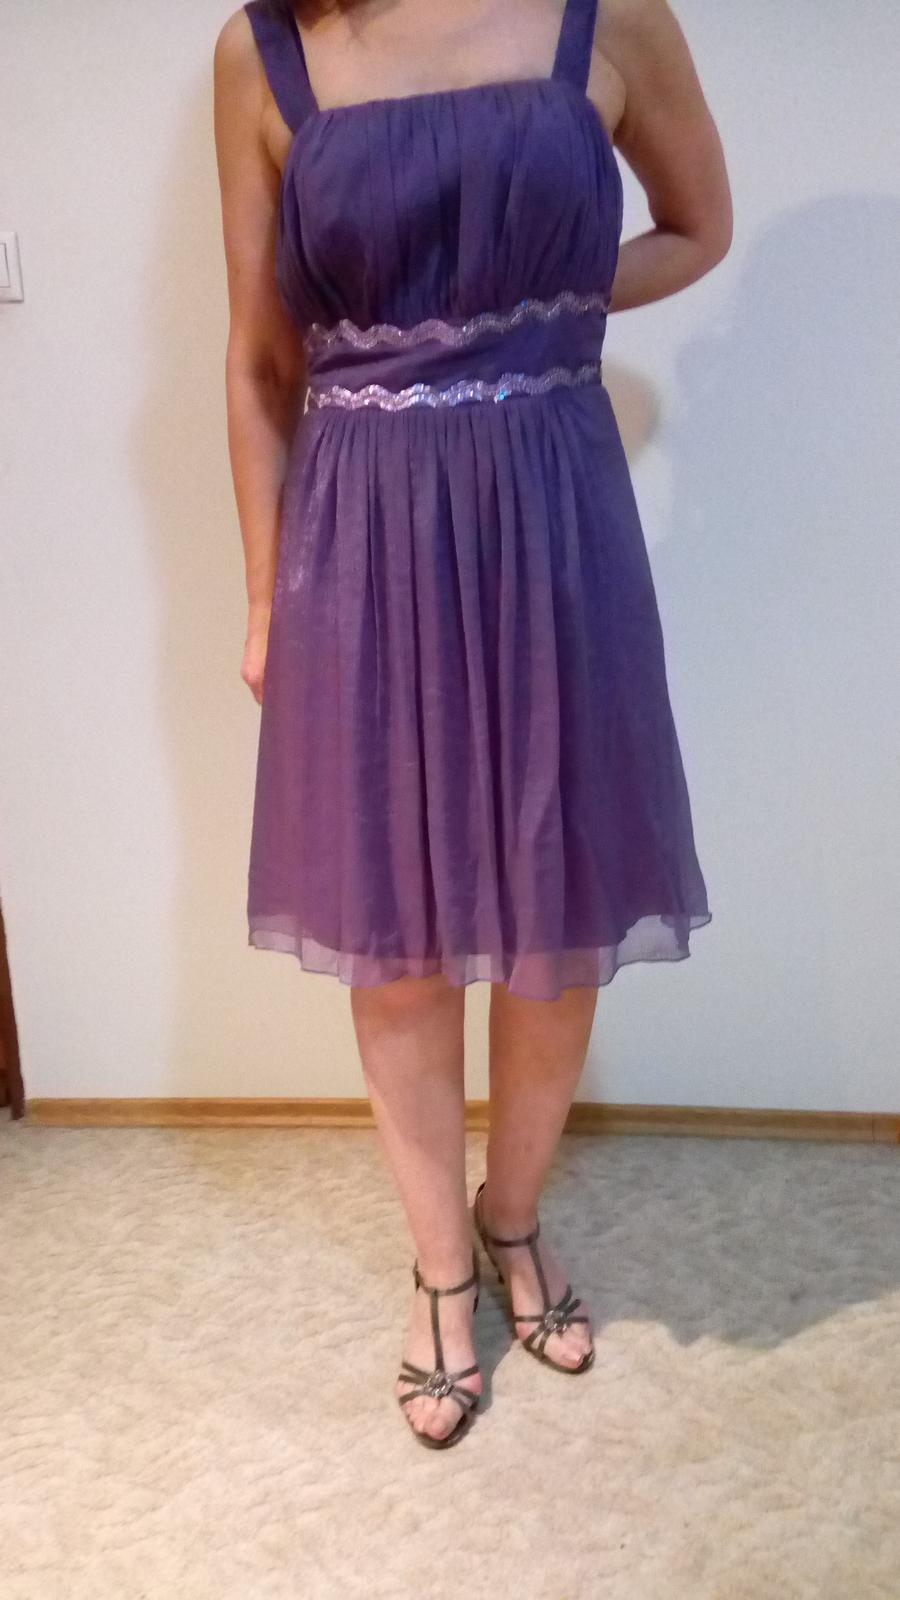 fialové šaty L-XL - Obrázok č. 1